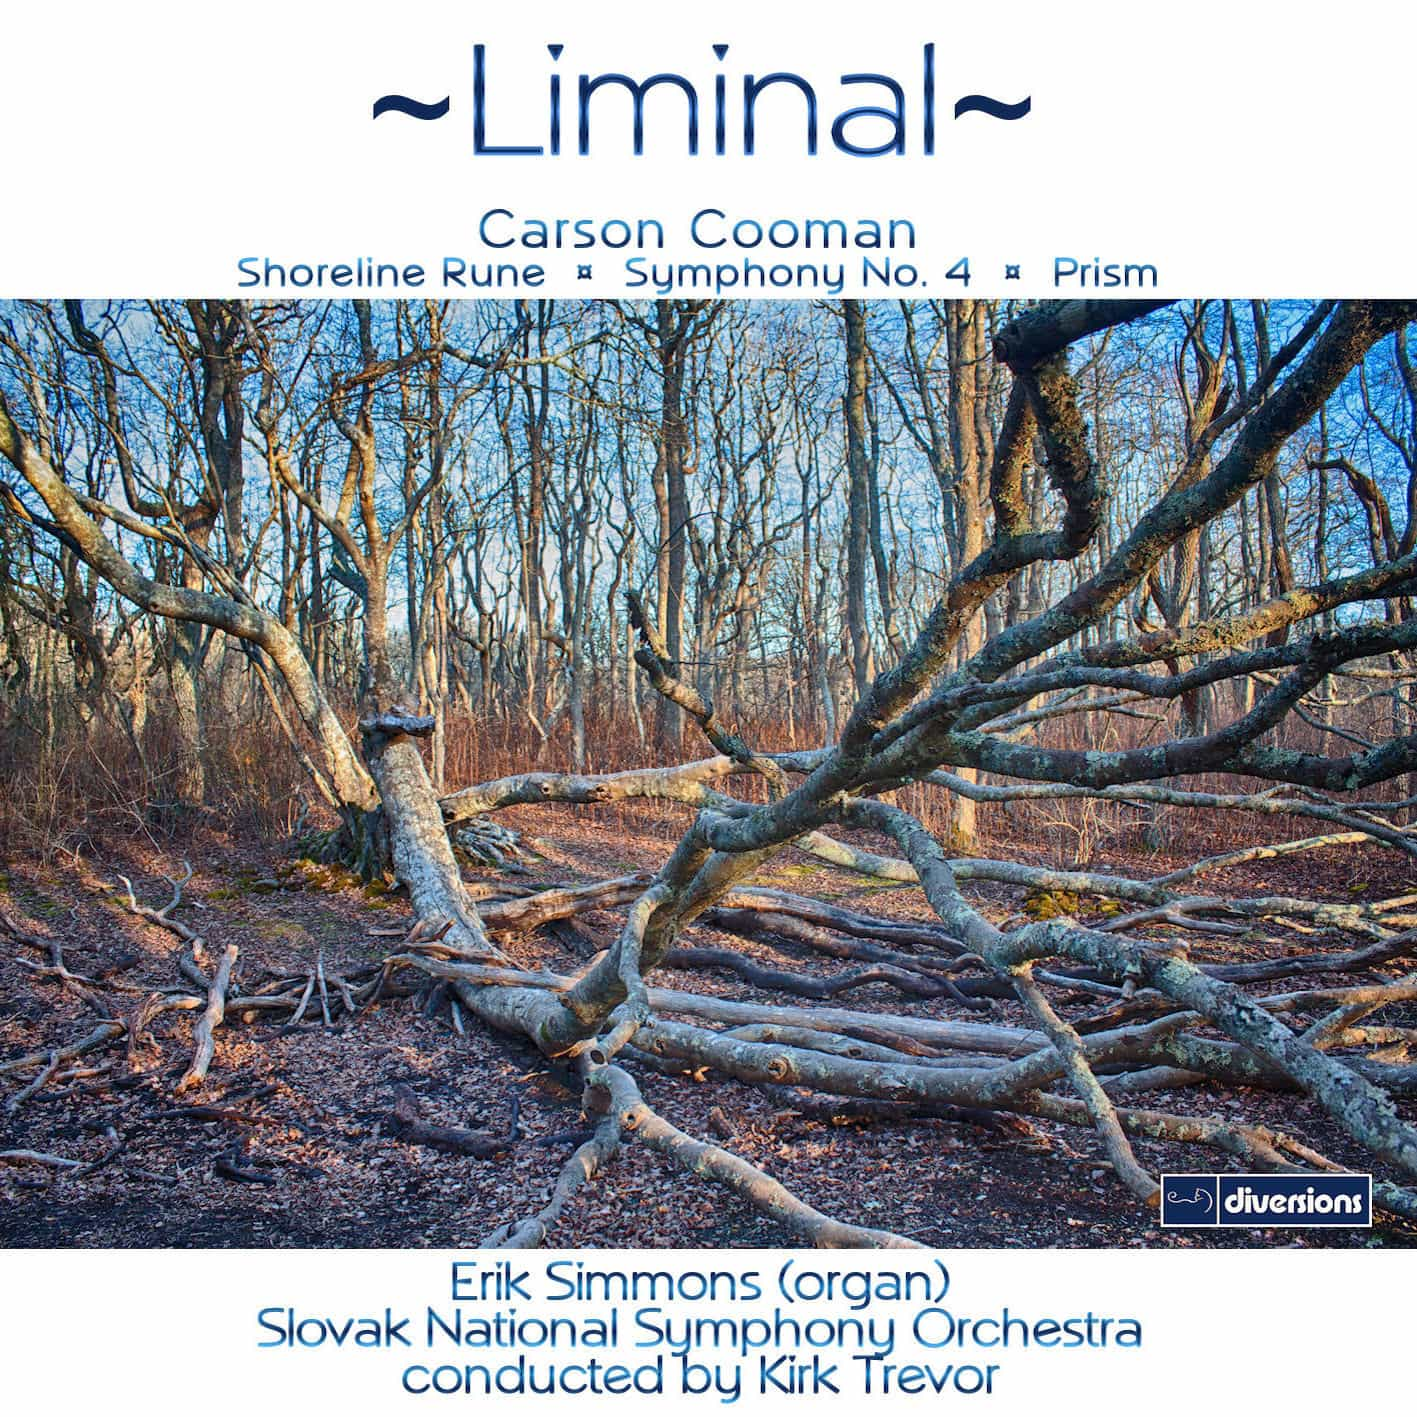 Carson Cooman - Liminal